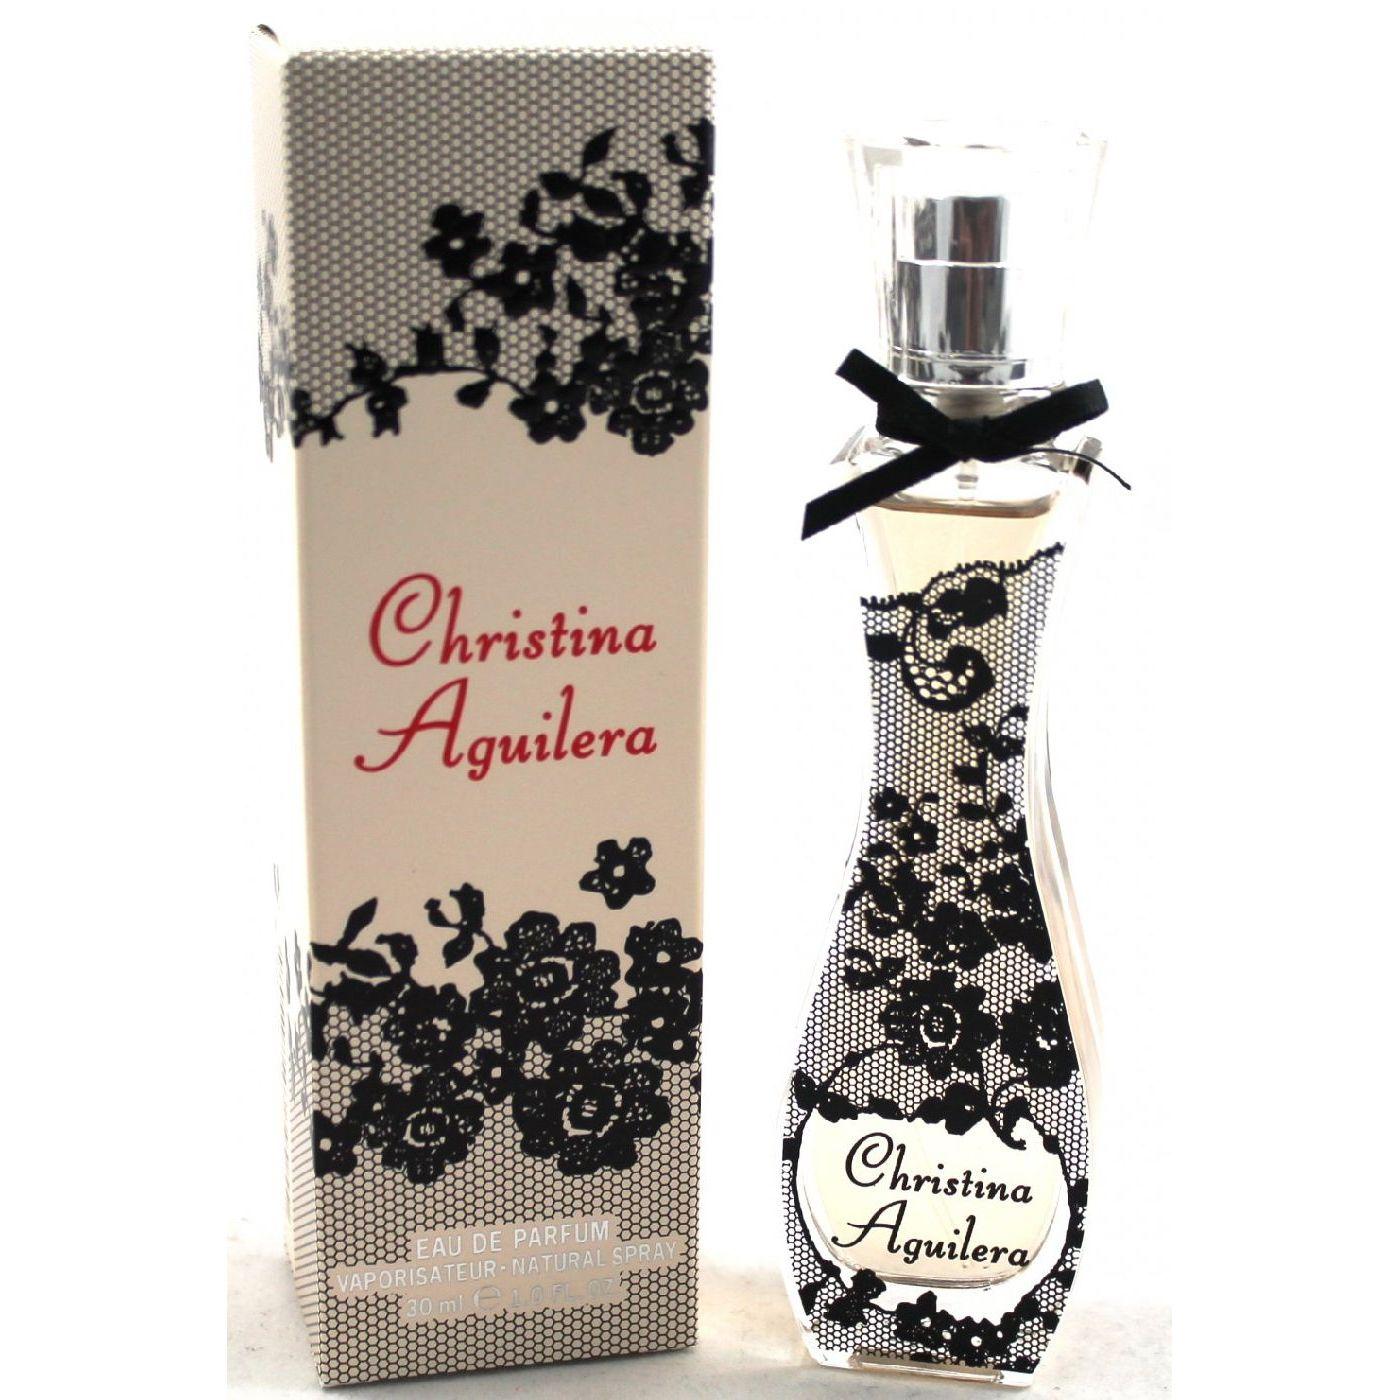 christina aguilera signature 30ml eau de parfum 30 ml edp. Black Bedroom Furniture Sets. Home Design Ideas